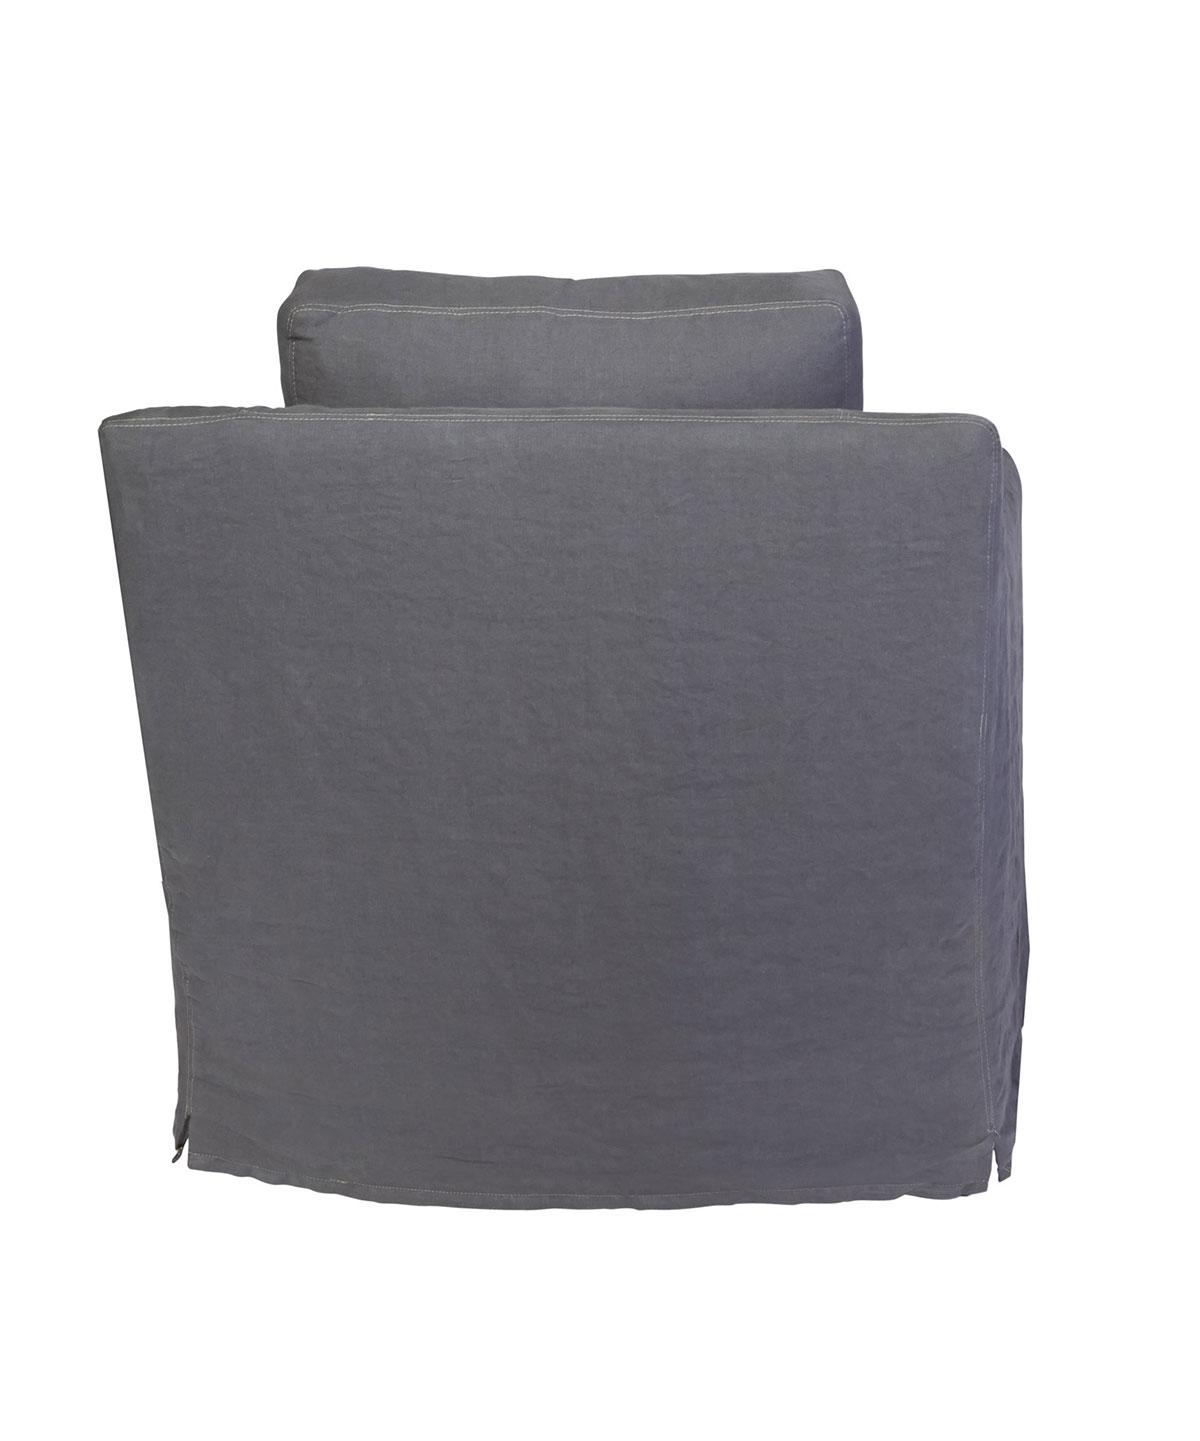 Hayden Slipcovered Chair